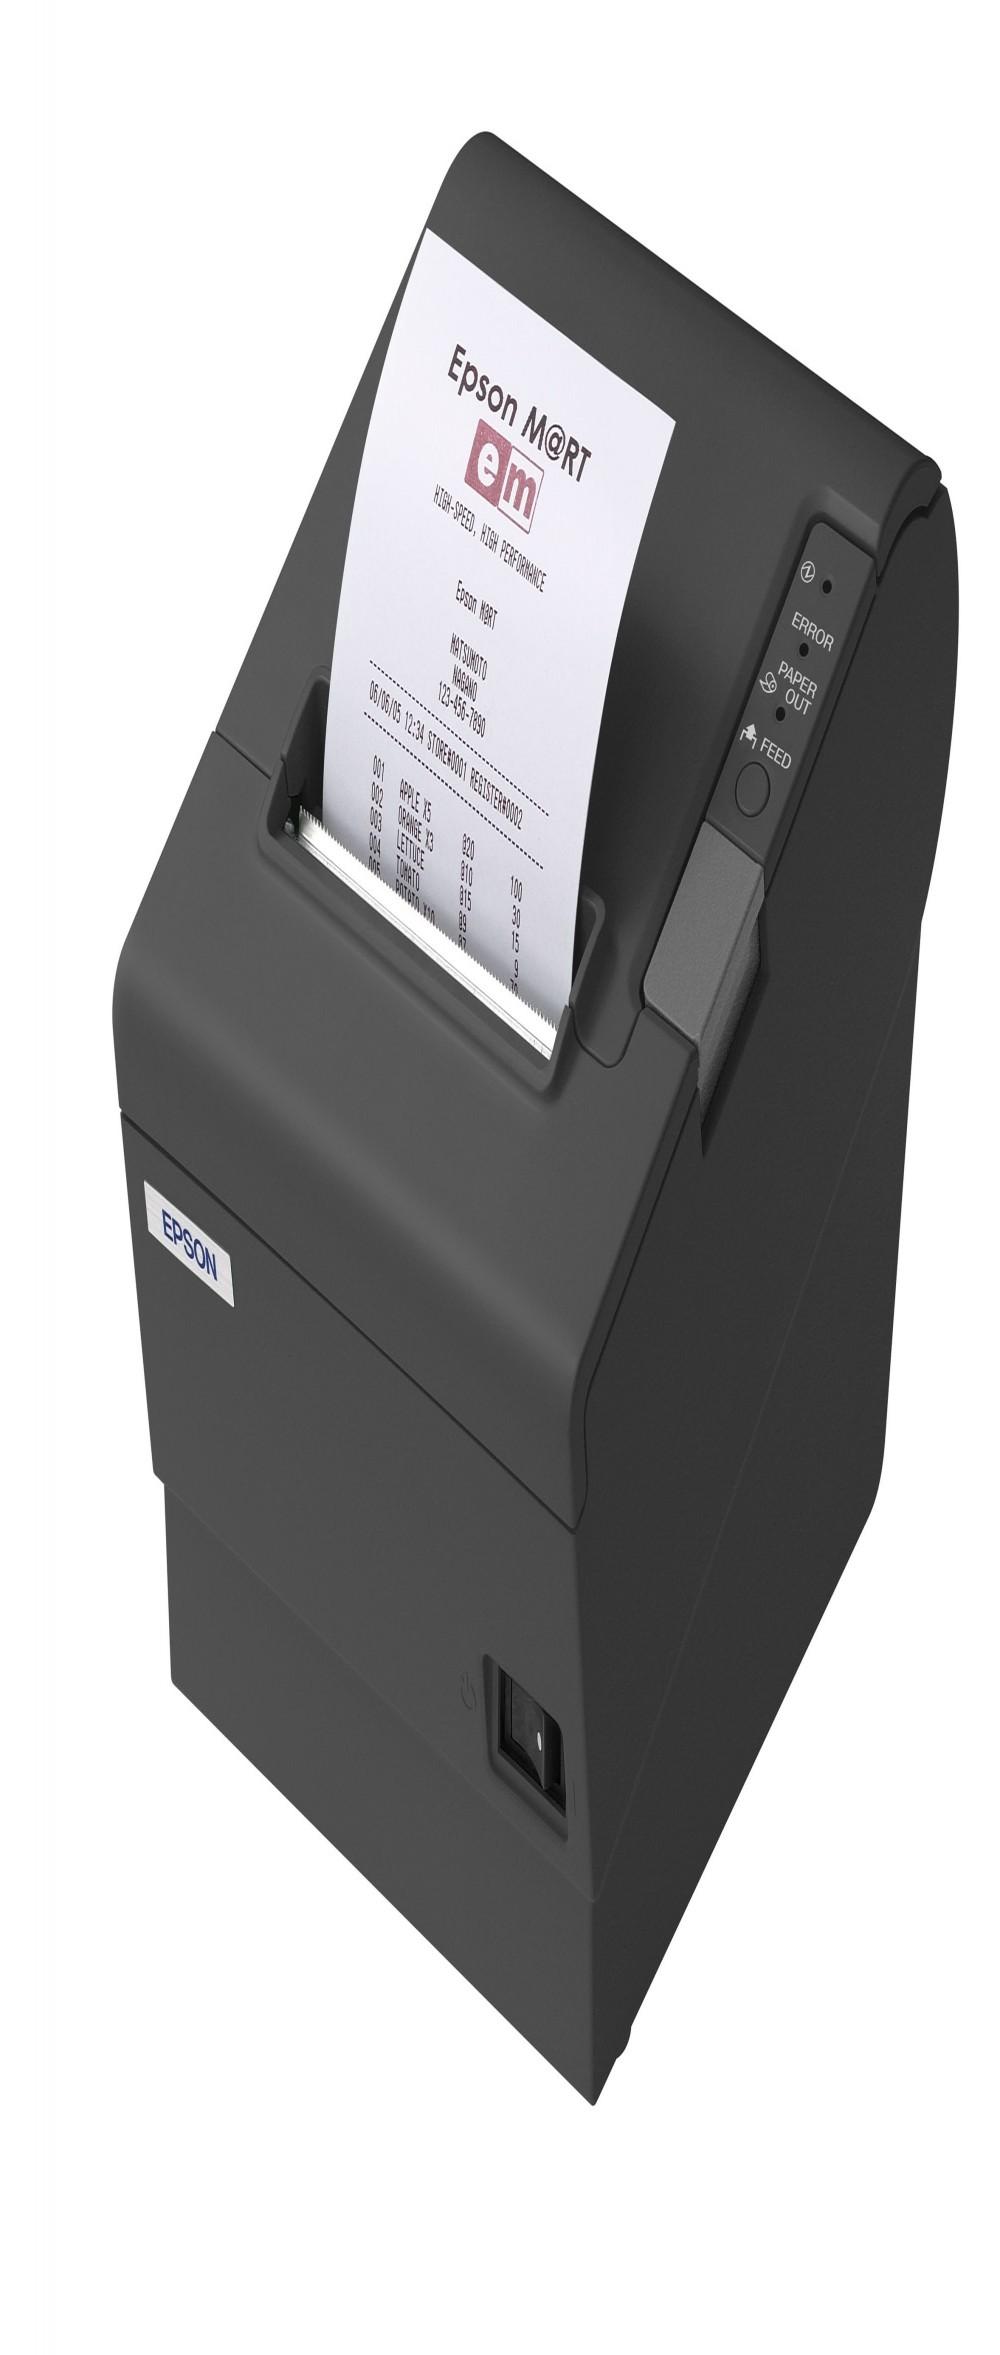 Impressora Epson TM-T88V-834 Termica Bivolt